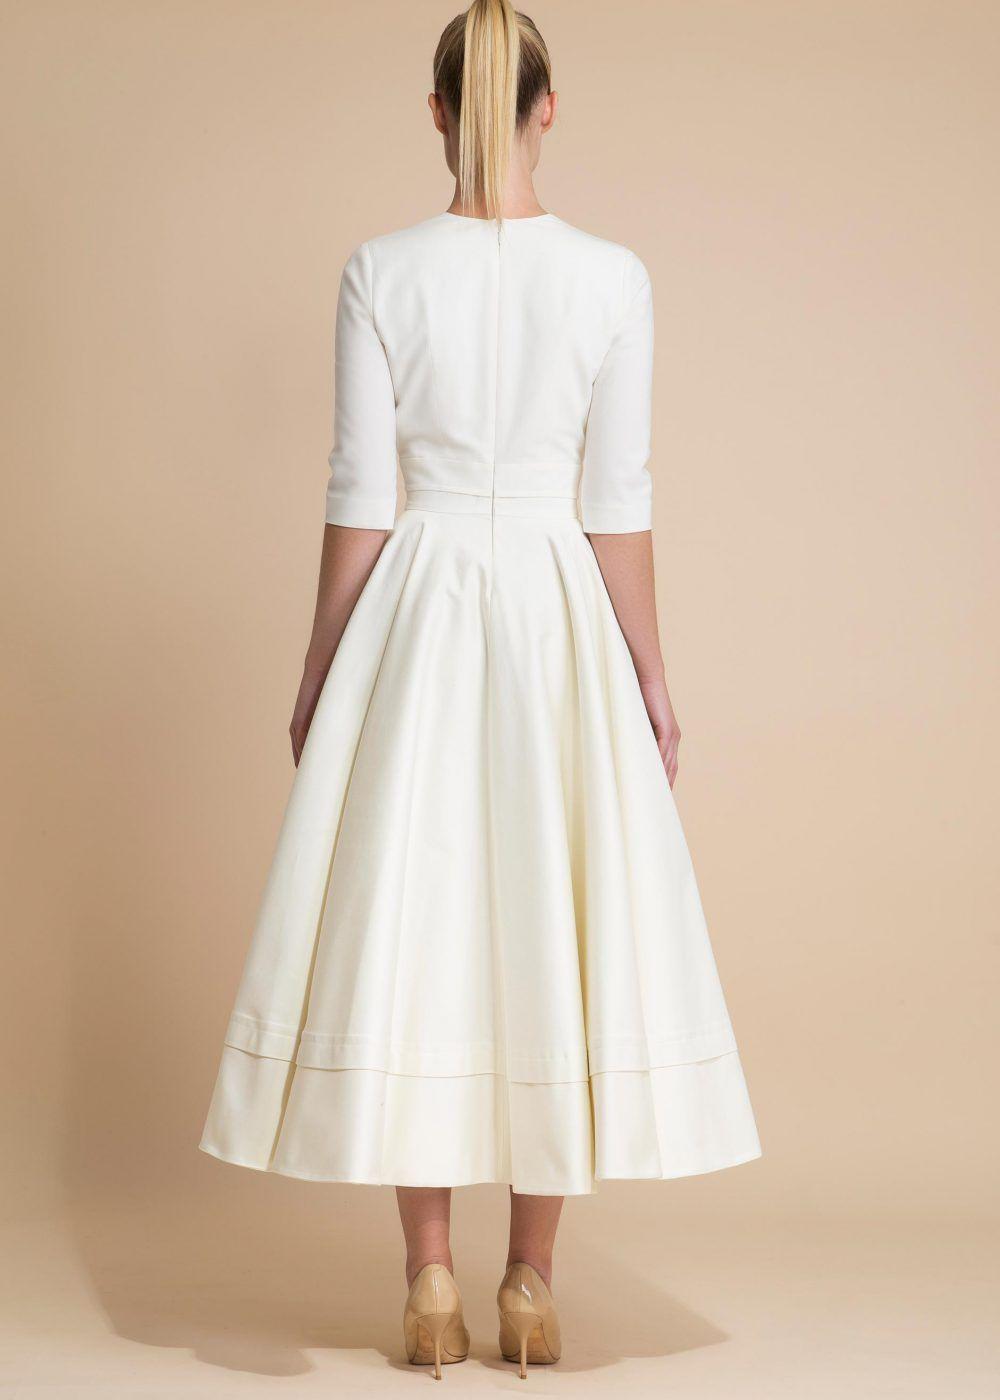 robe de mari e longueur midi avec encolure en v wedding dress pinterest mariage mariage. Black Bedroom Furniture Sets. Home Design Ideas